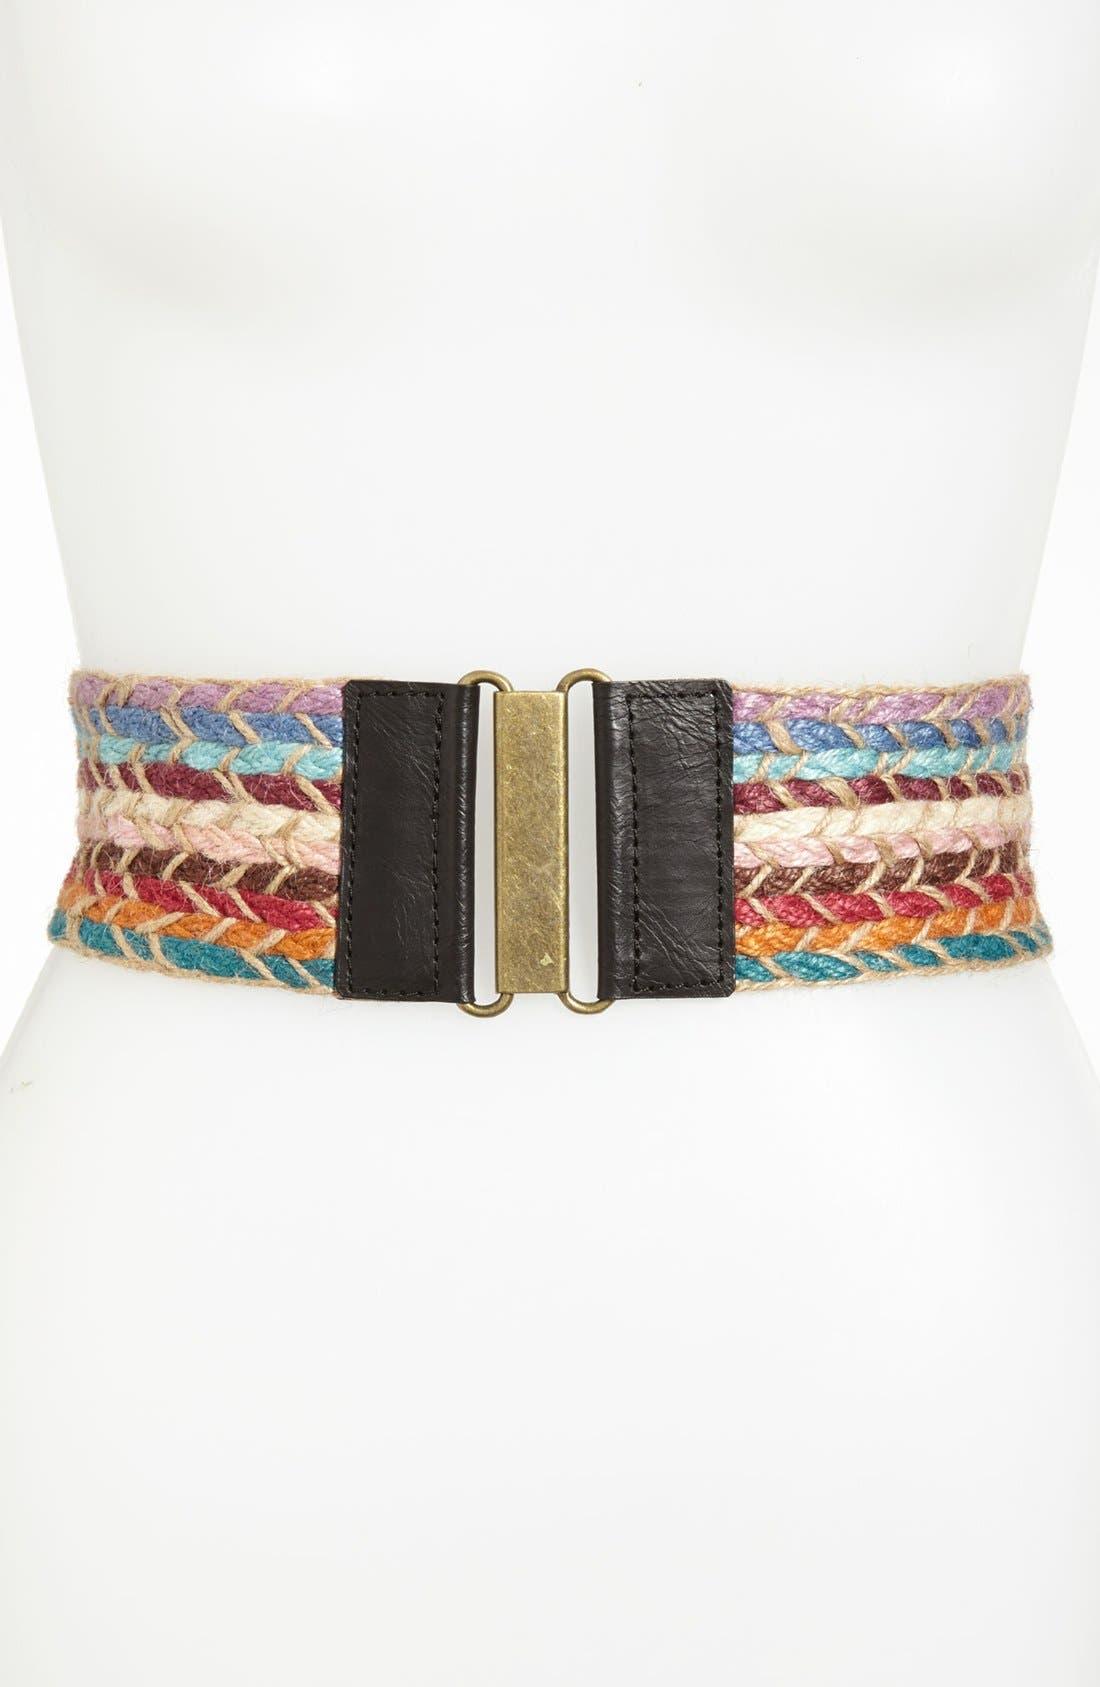 Alternate Image 1 Selected - Belgo Lux Chunky Yarn Stretch Belt